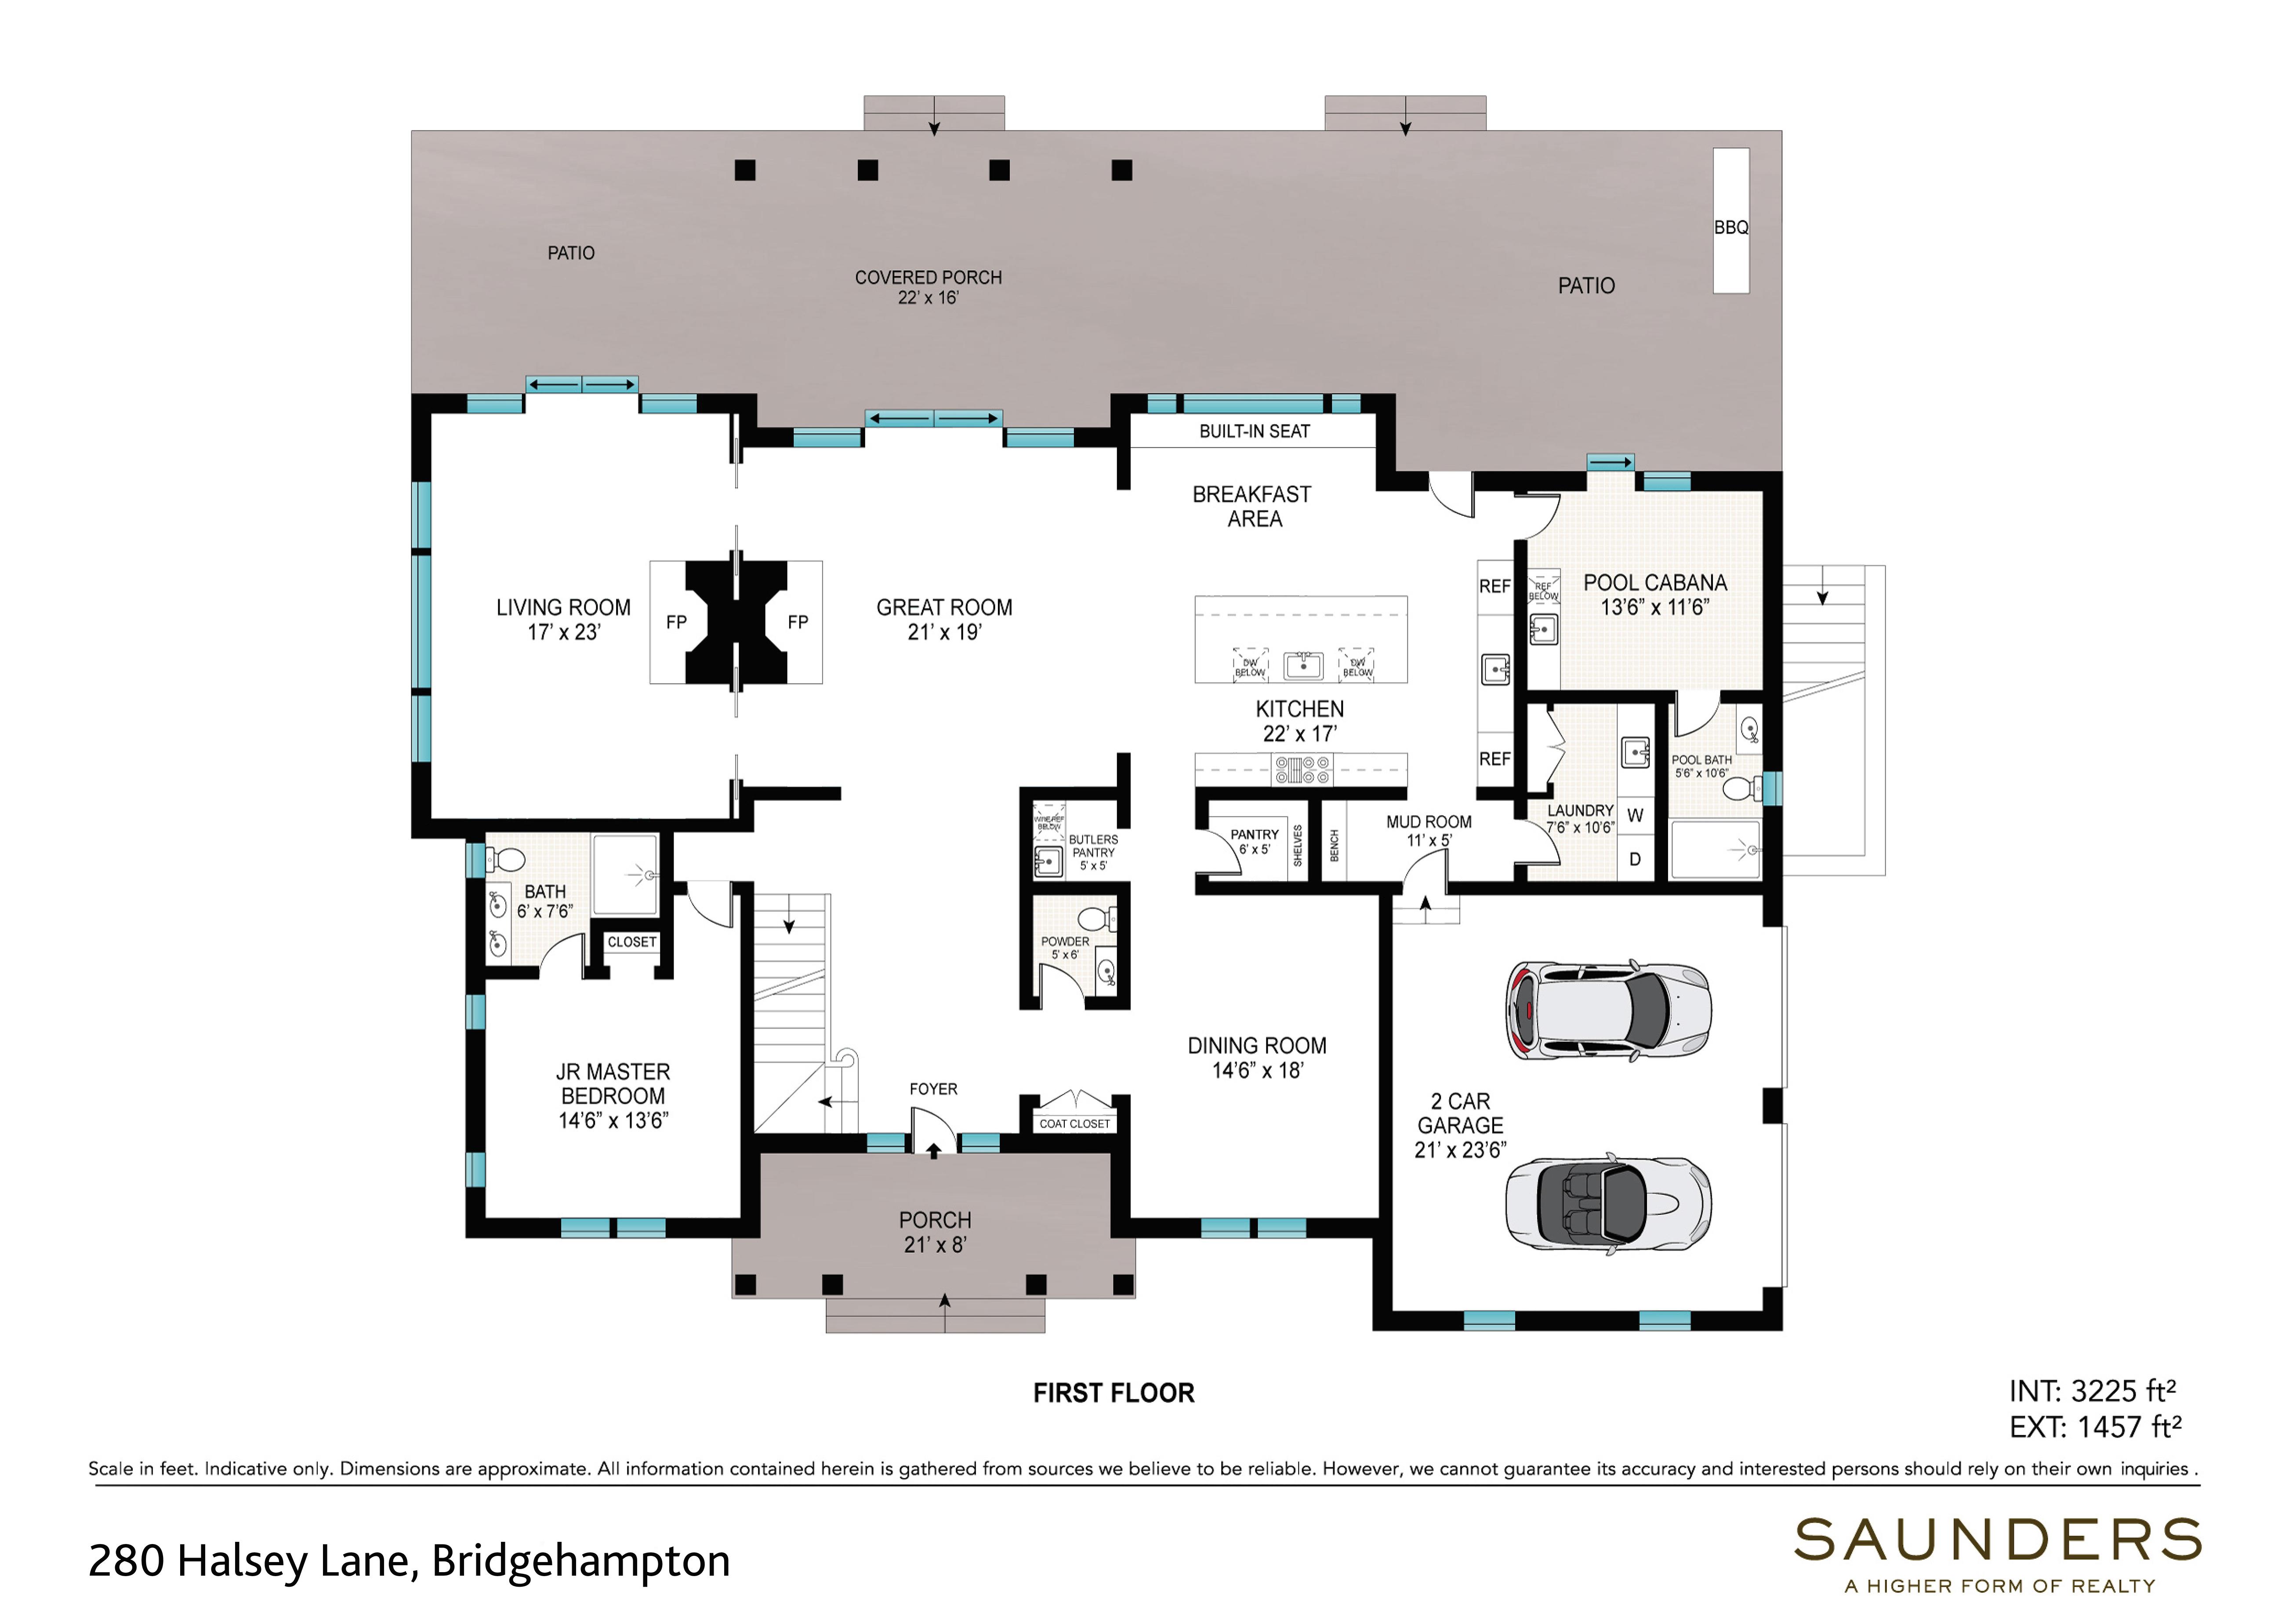 Casa Unifamiliar por un Alquiler en Bridgehampton South Summer Rental On Reserve 280 Halsey Lane, Bridgehampton, Nueva York